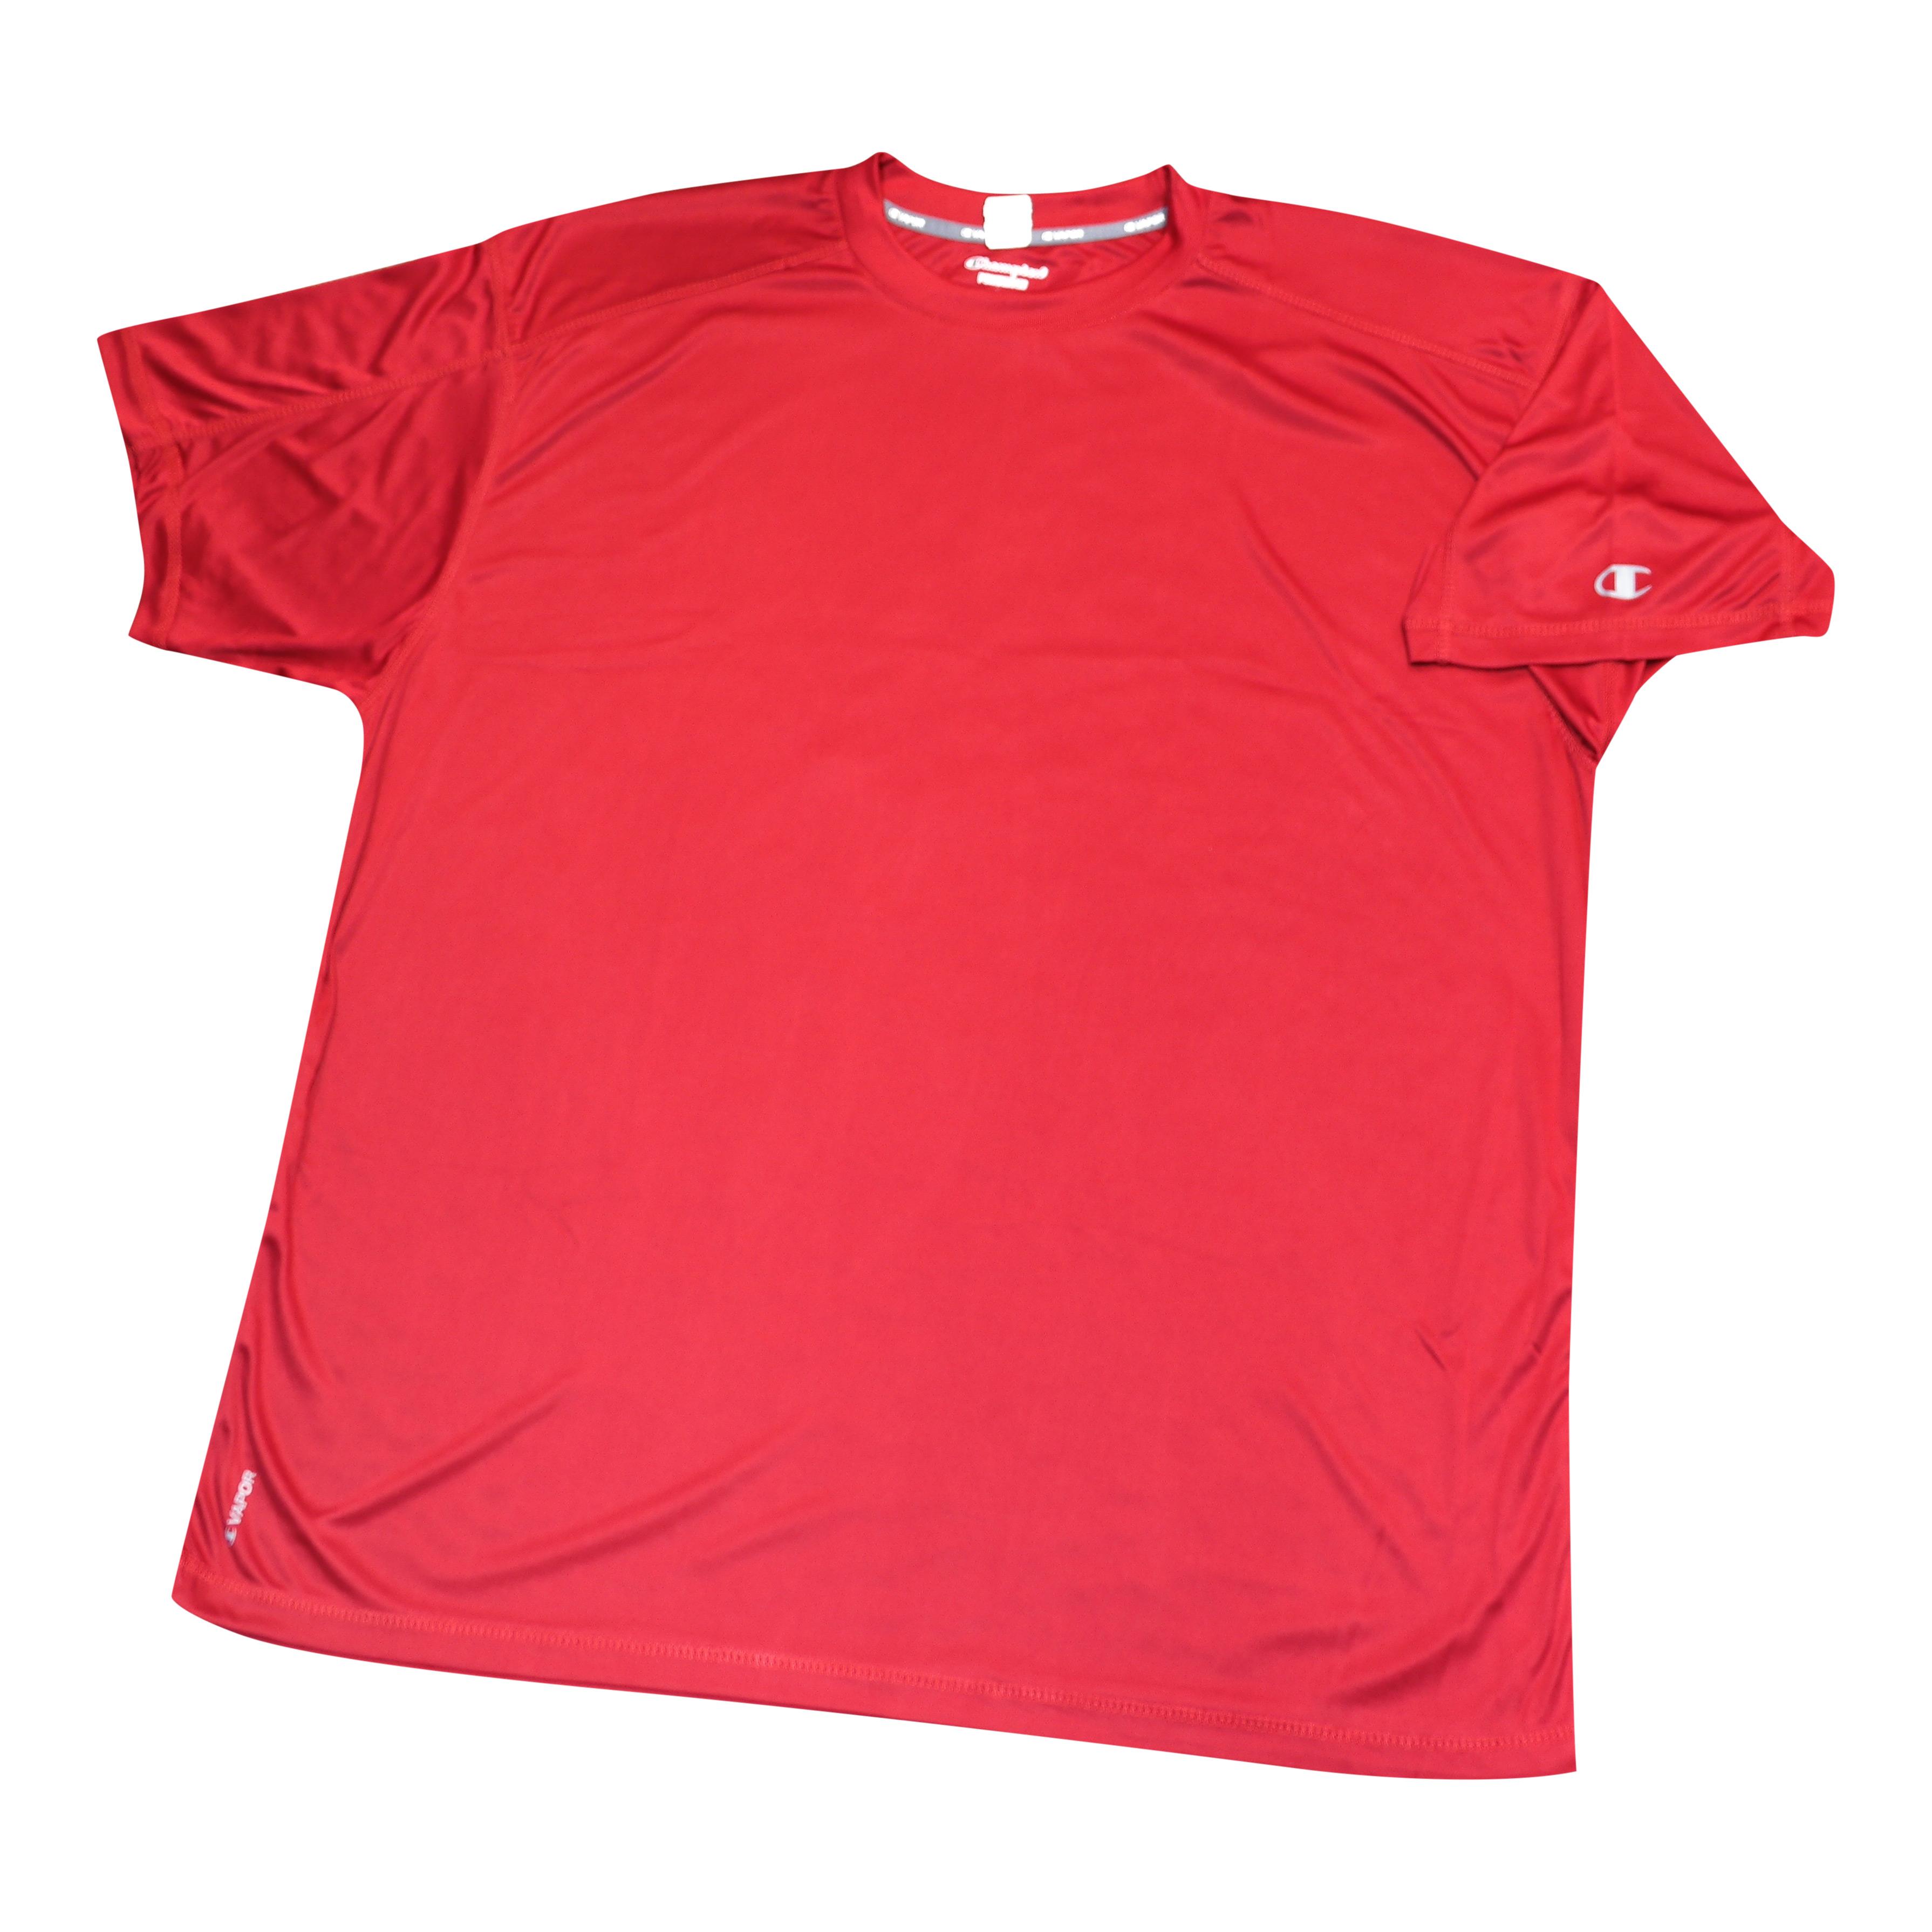 "Champion Dri-Power ""Vapor"" Red Tee Shirt"